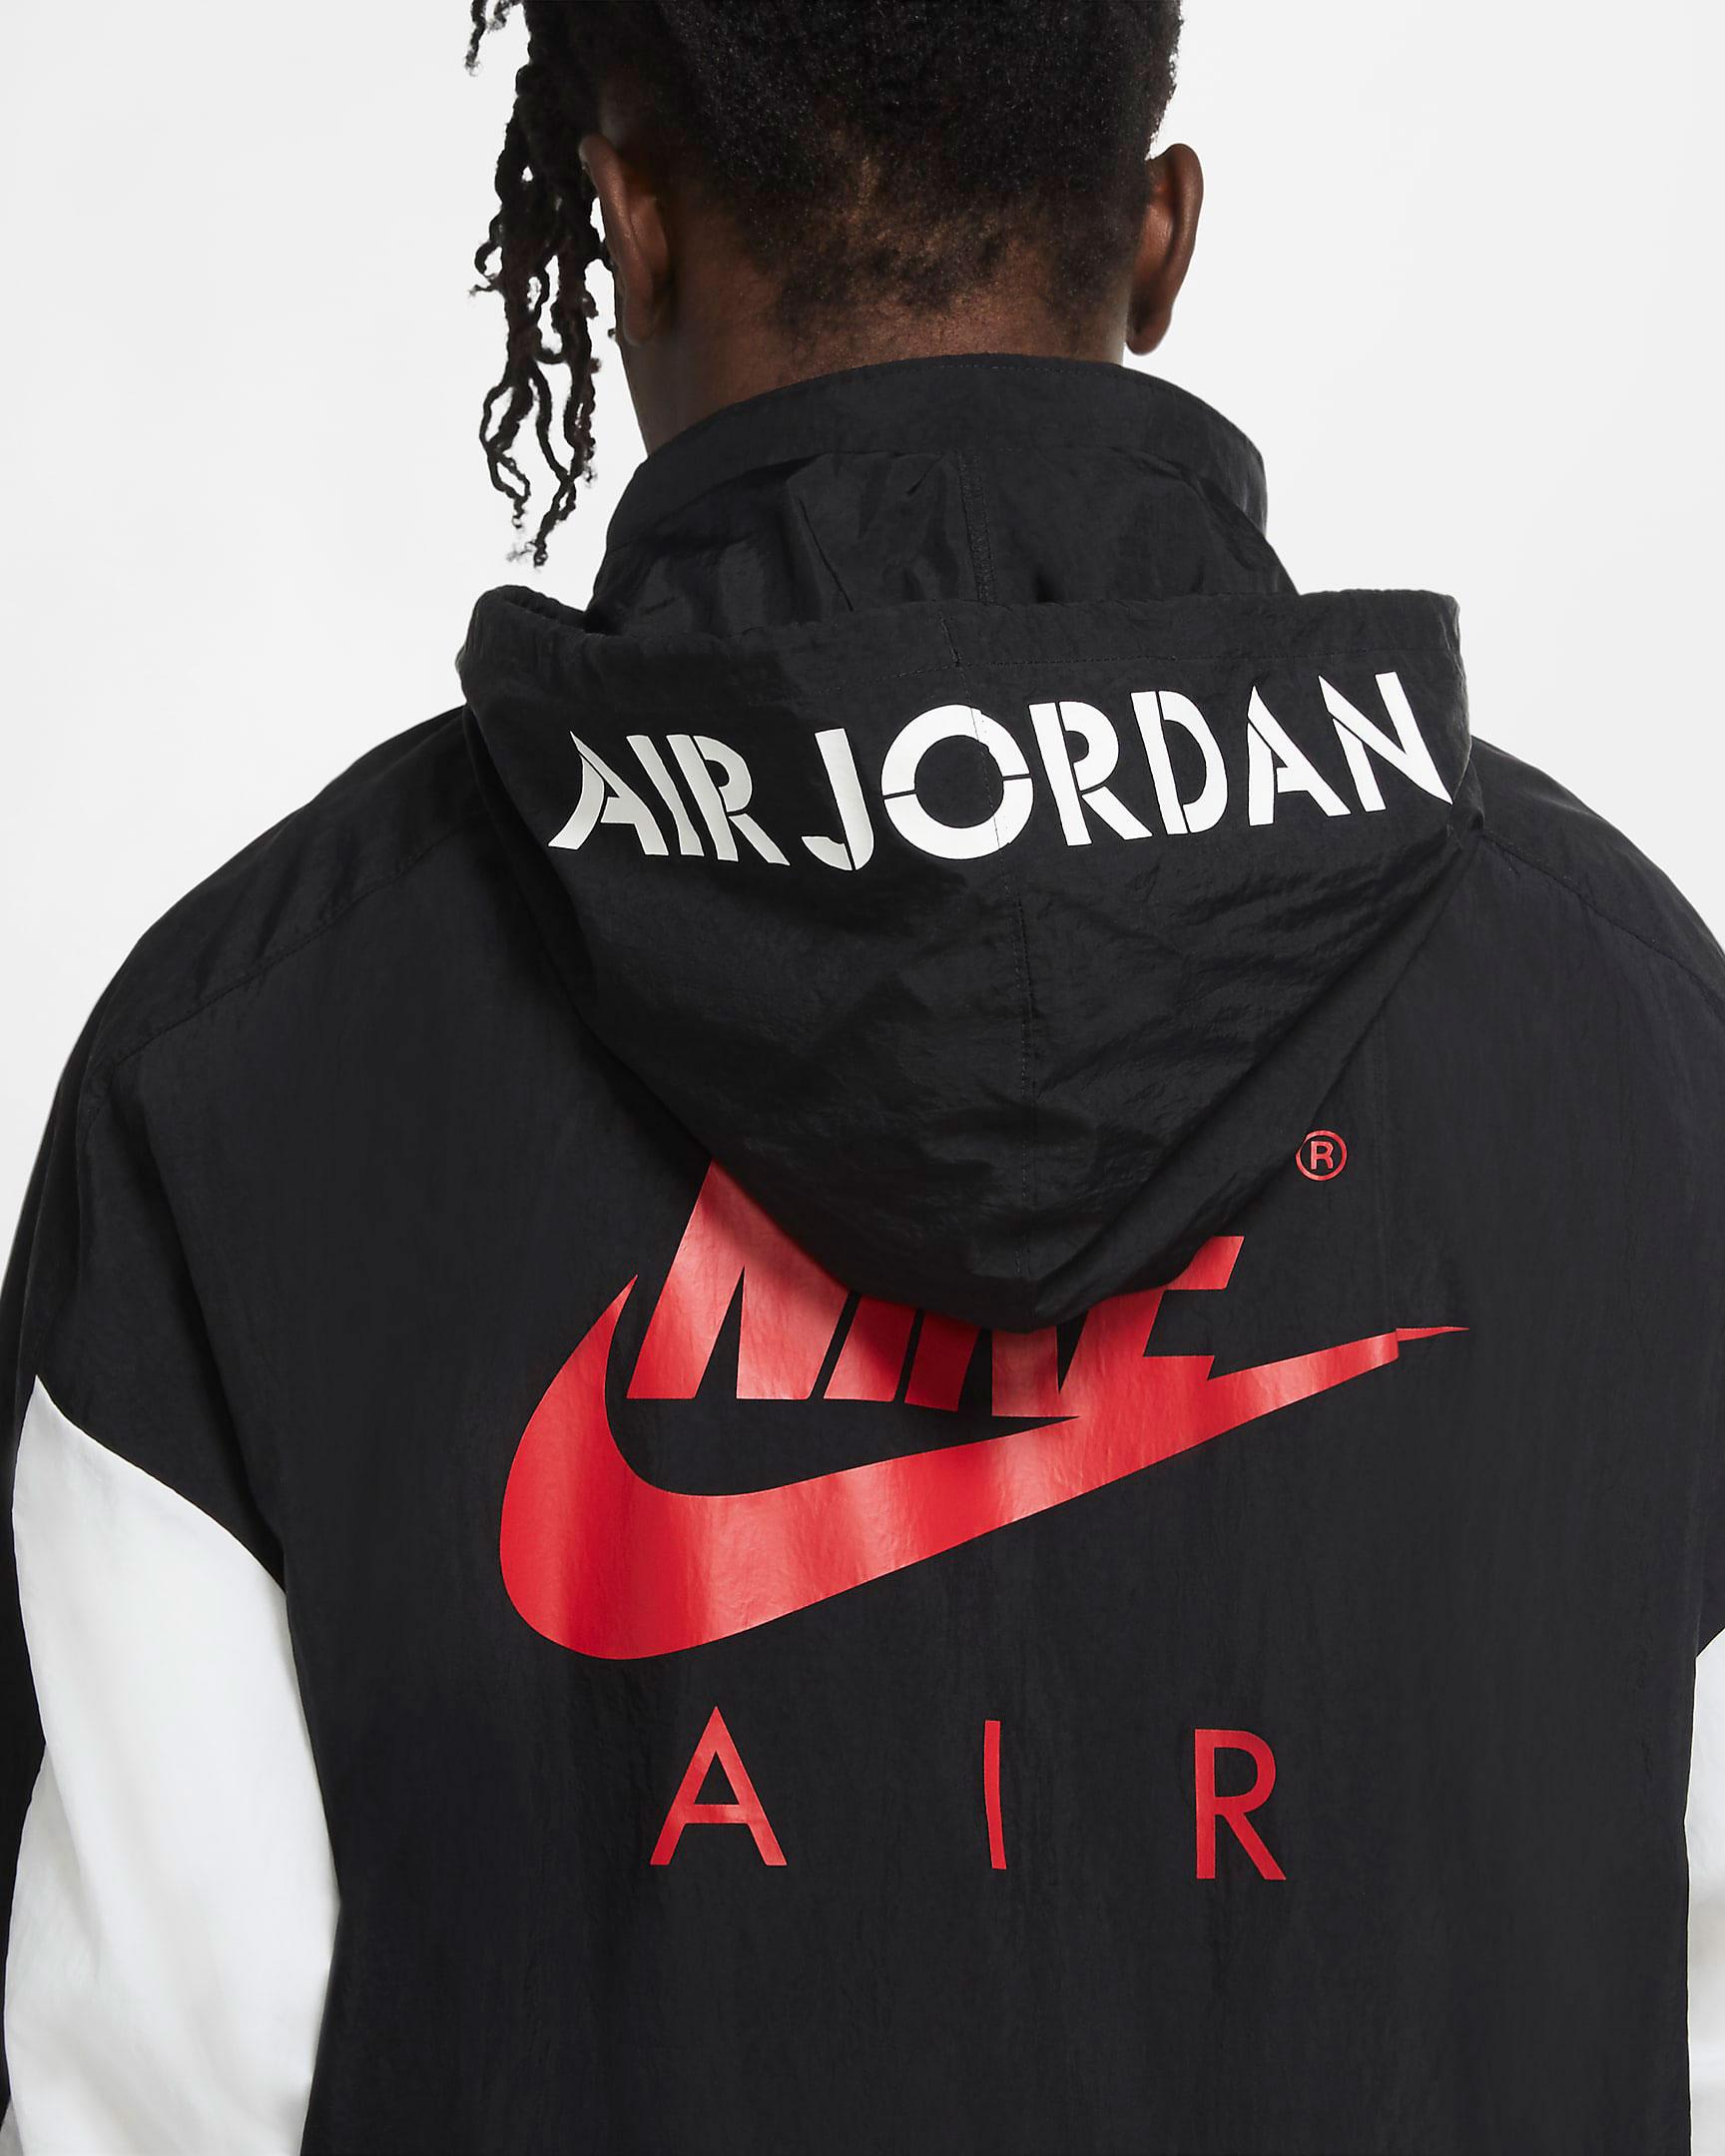 air-jordan-4-fire-red-2020-jacket-4